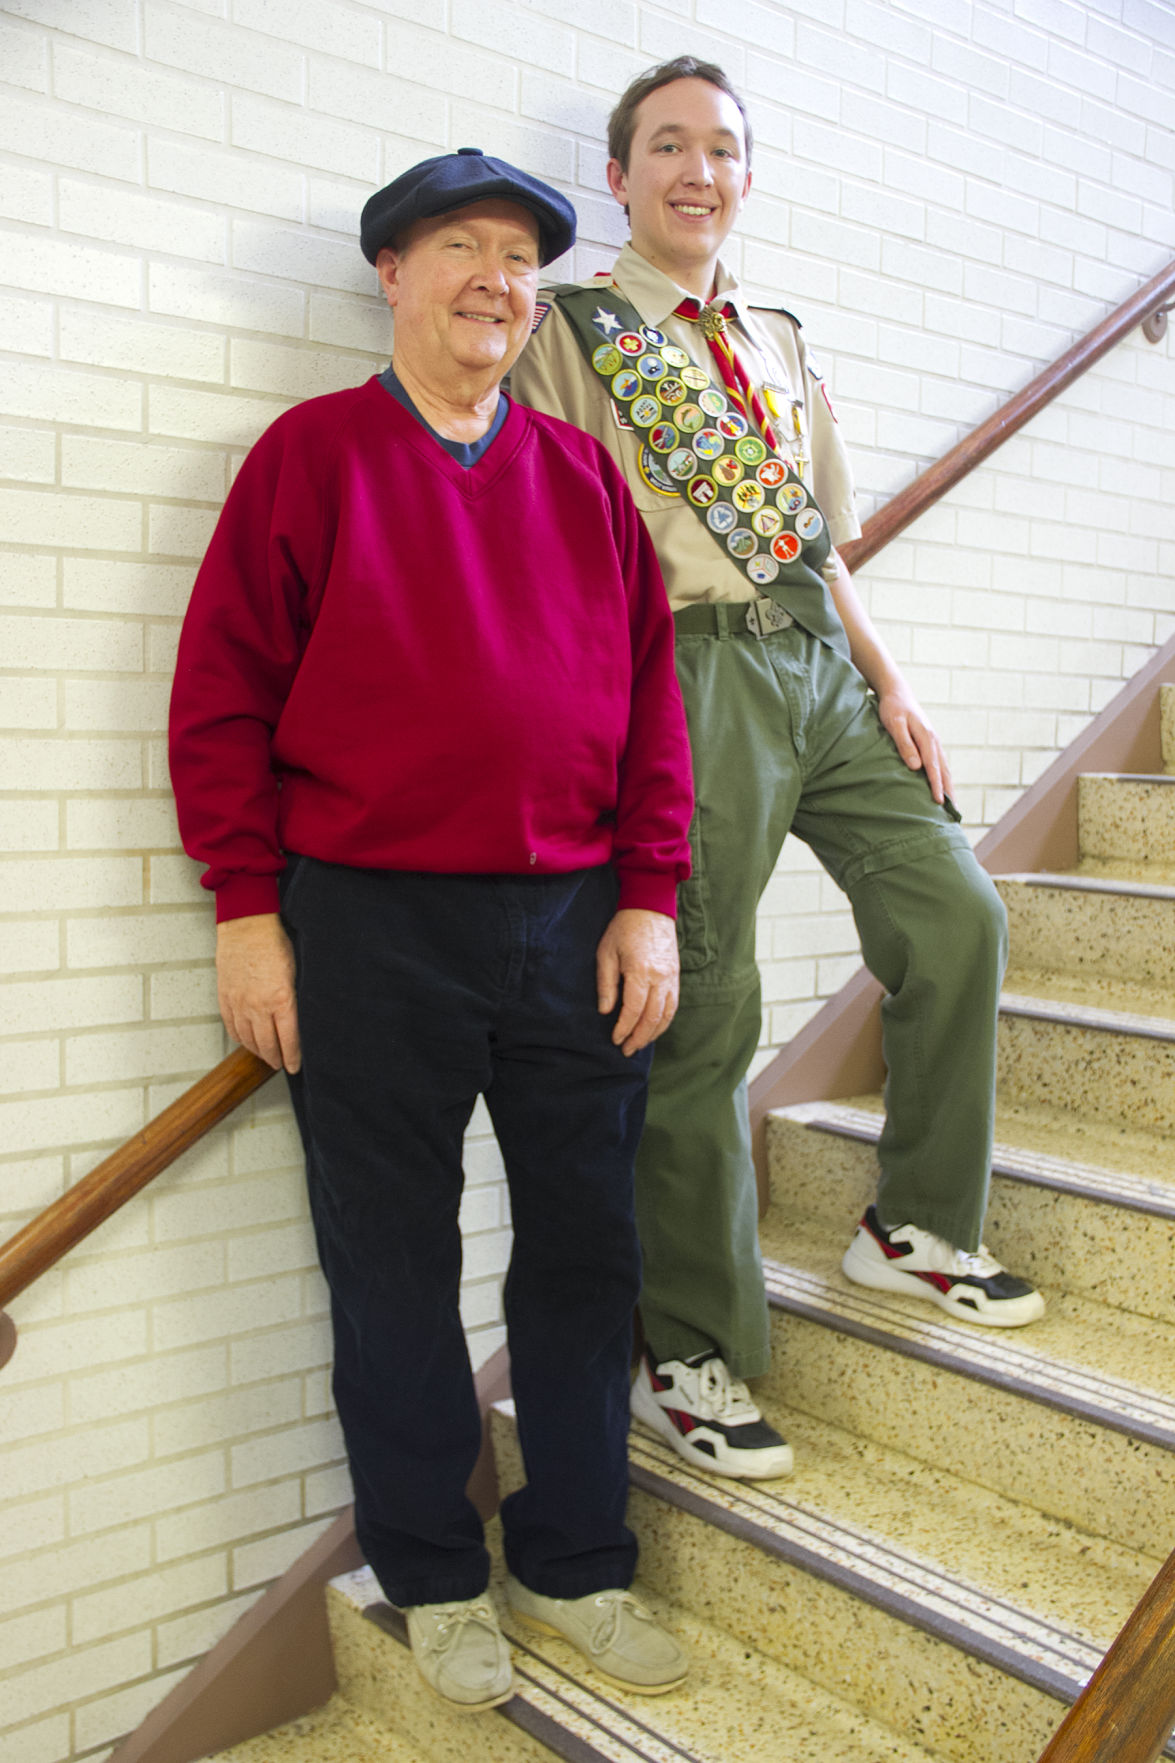 Greg and Michael Batko